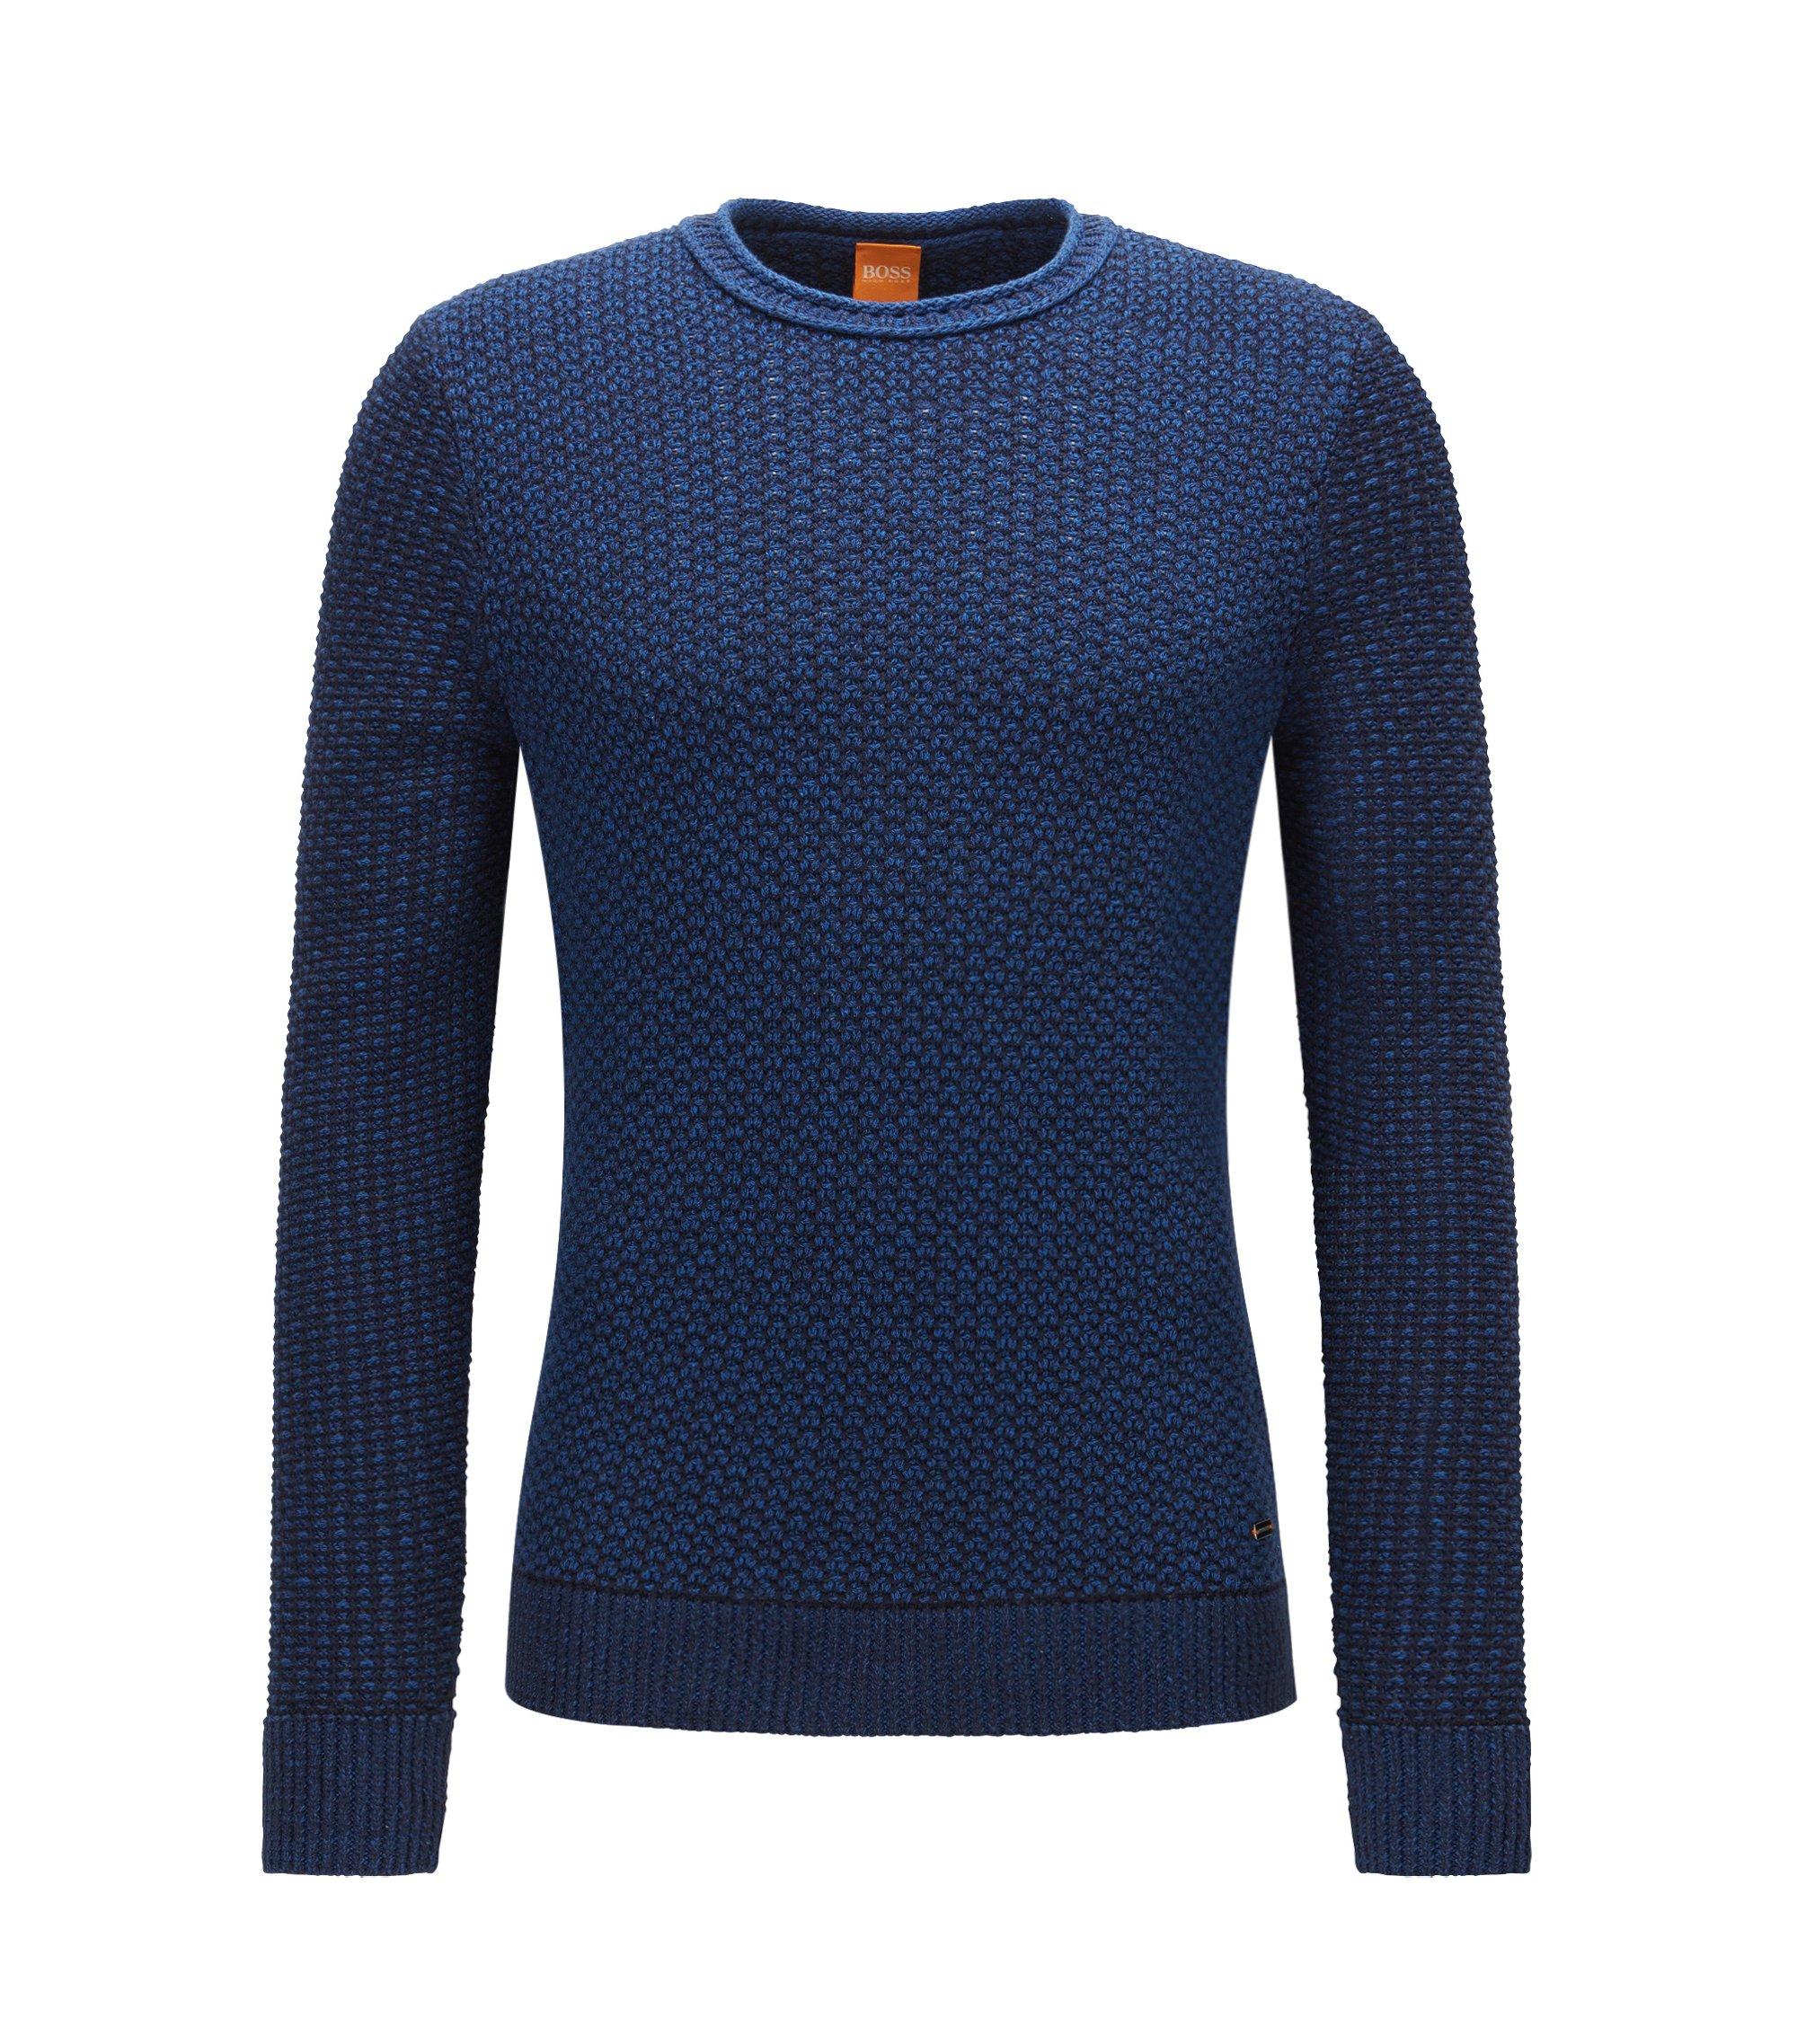 Dobby Cotton Sweater | Kindpaul, Blue